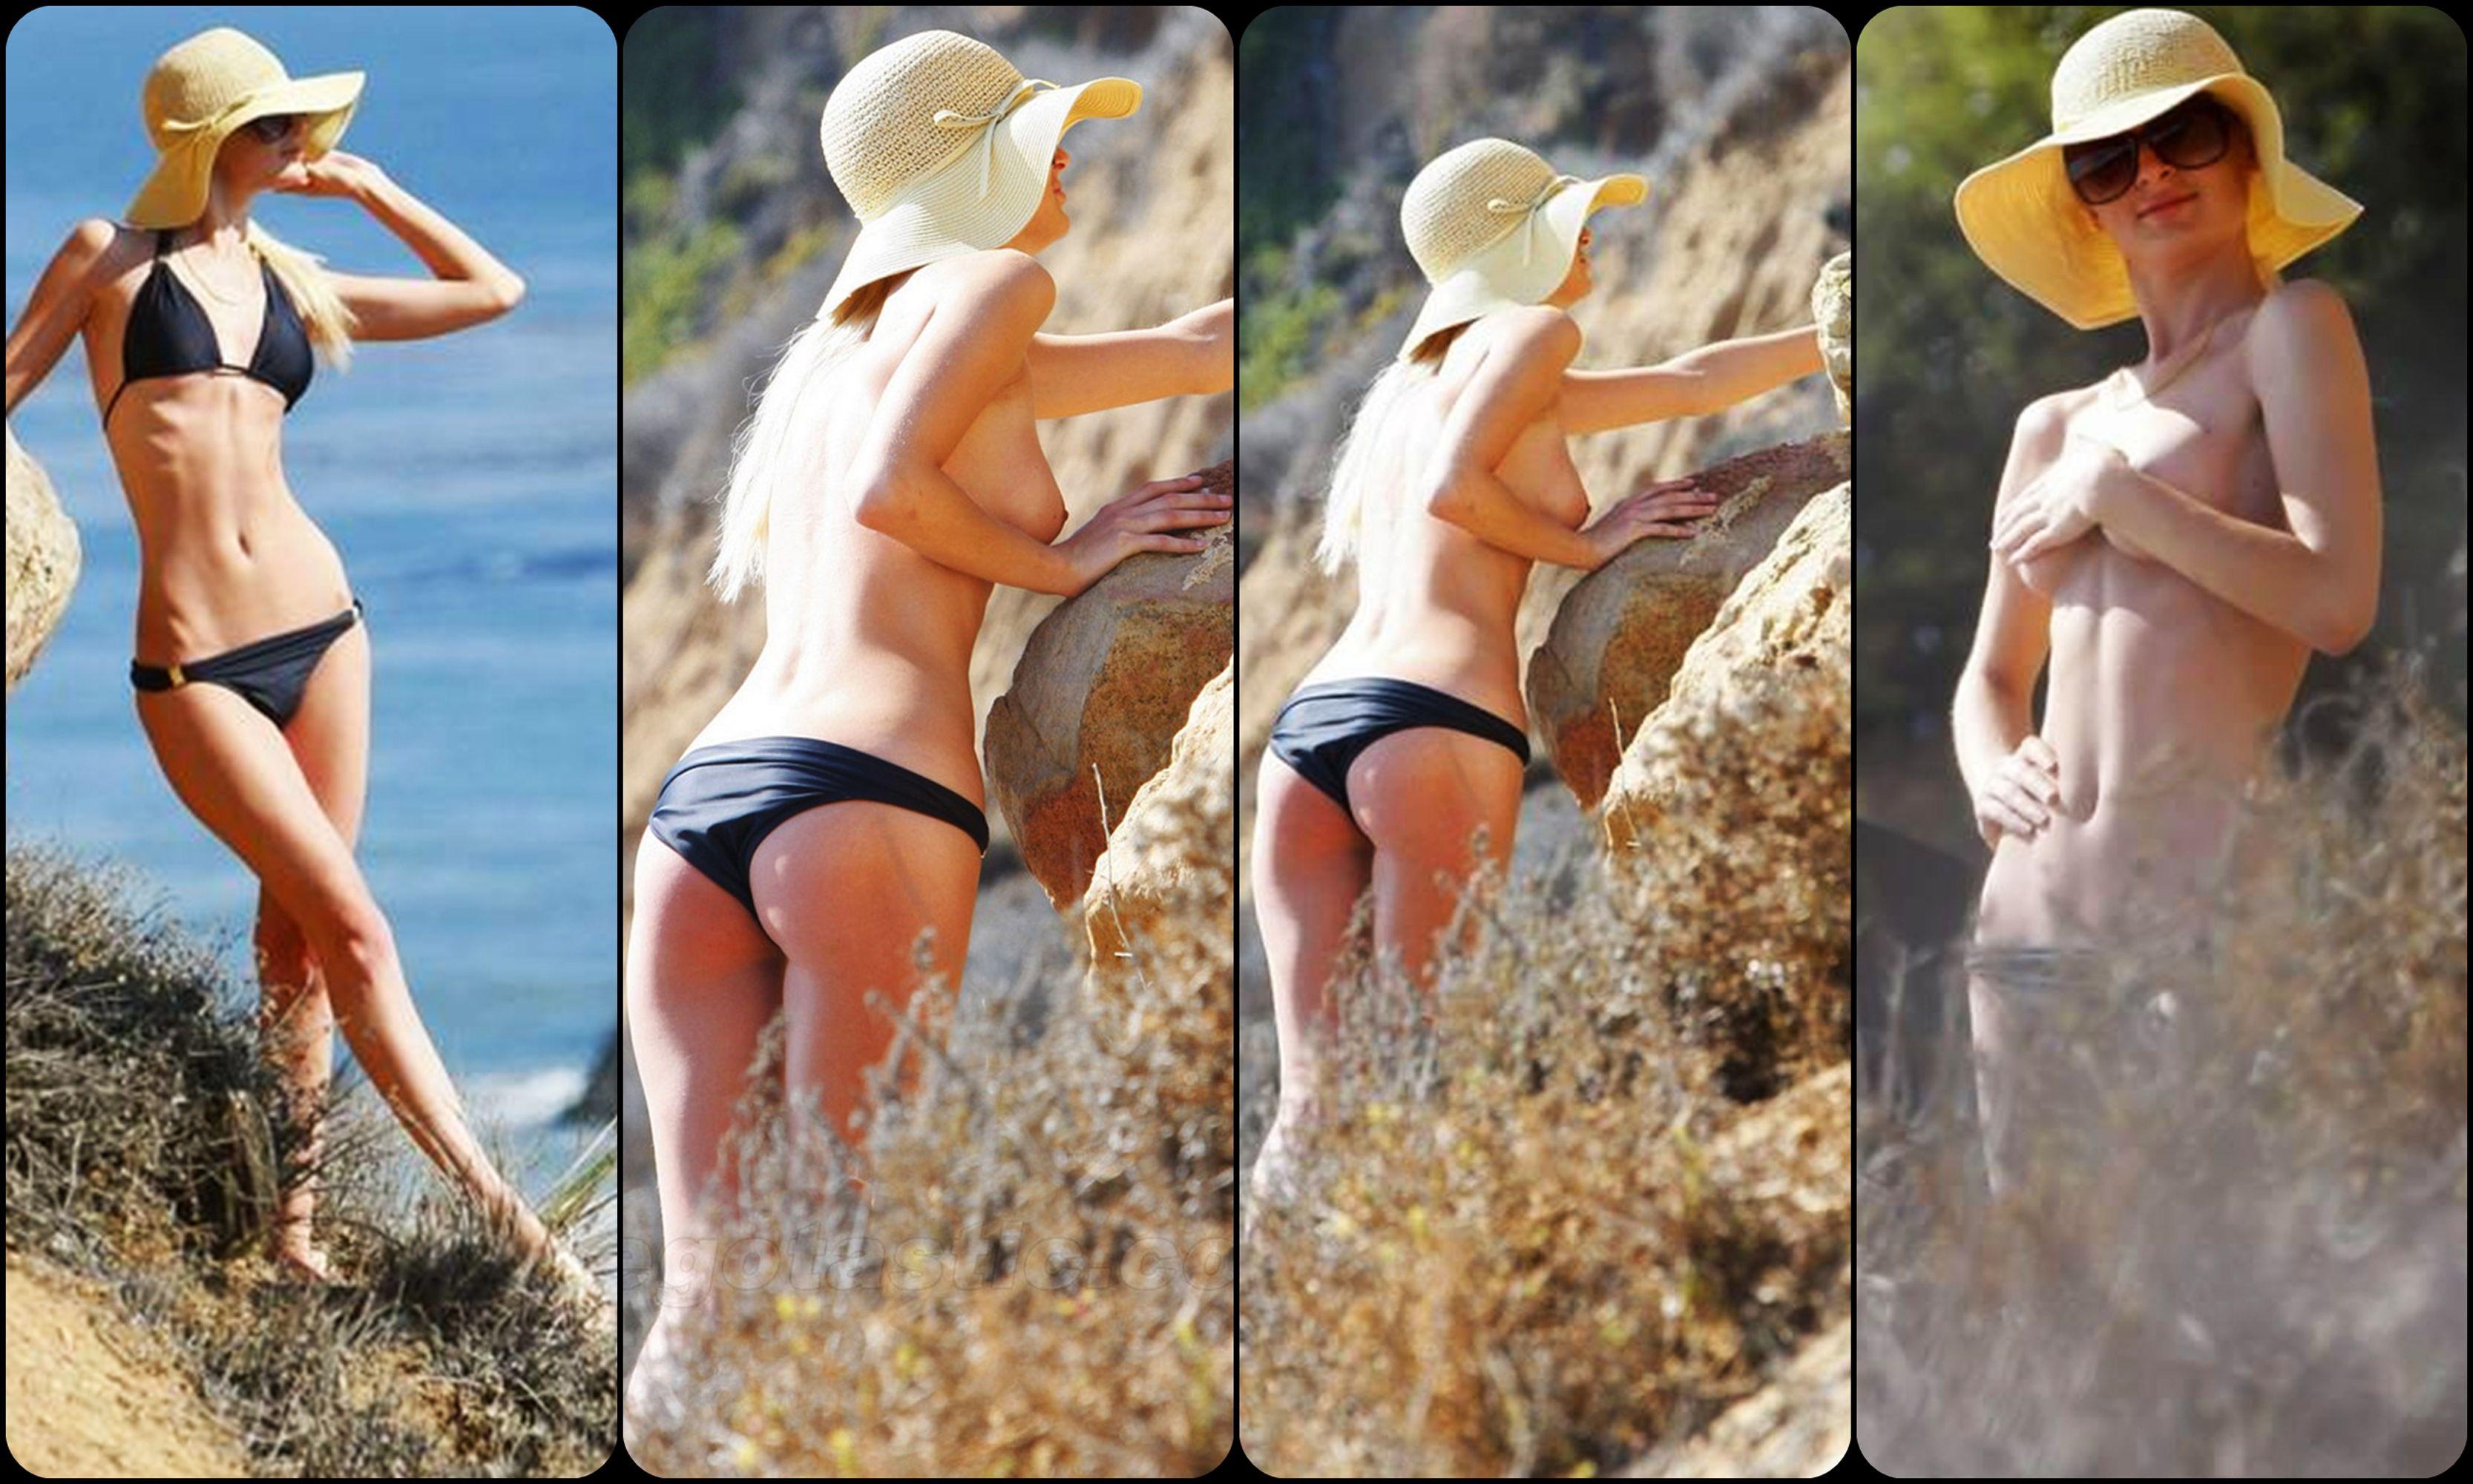 Paris Hilton riding big cock